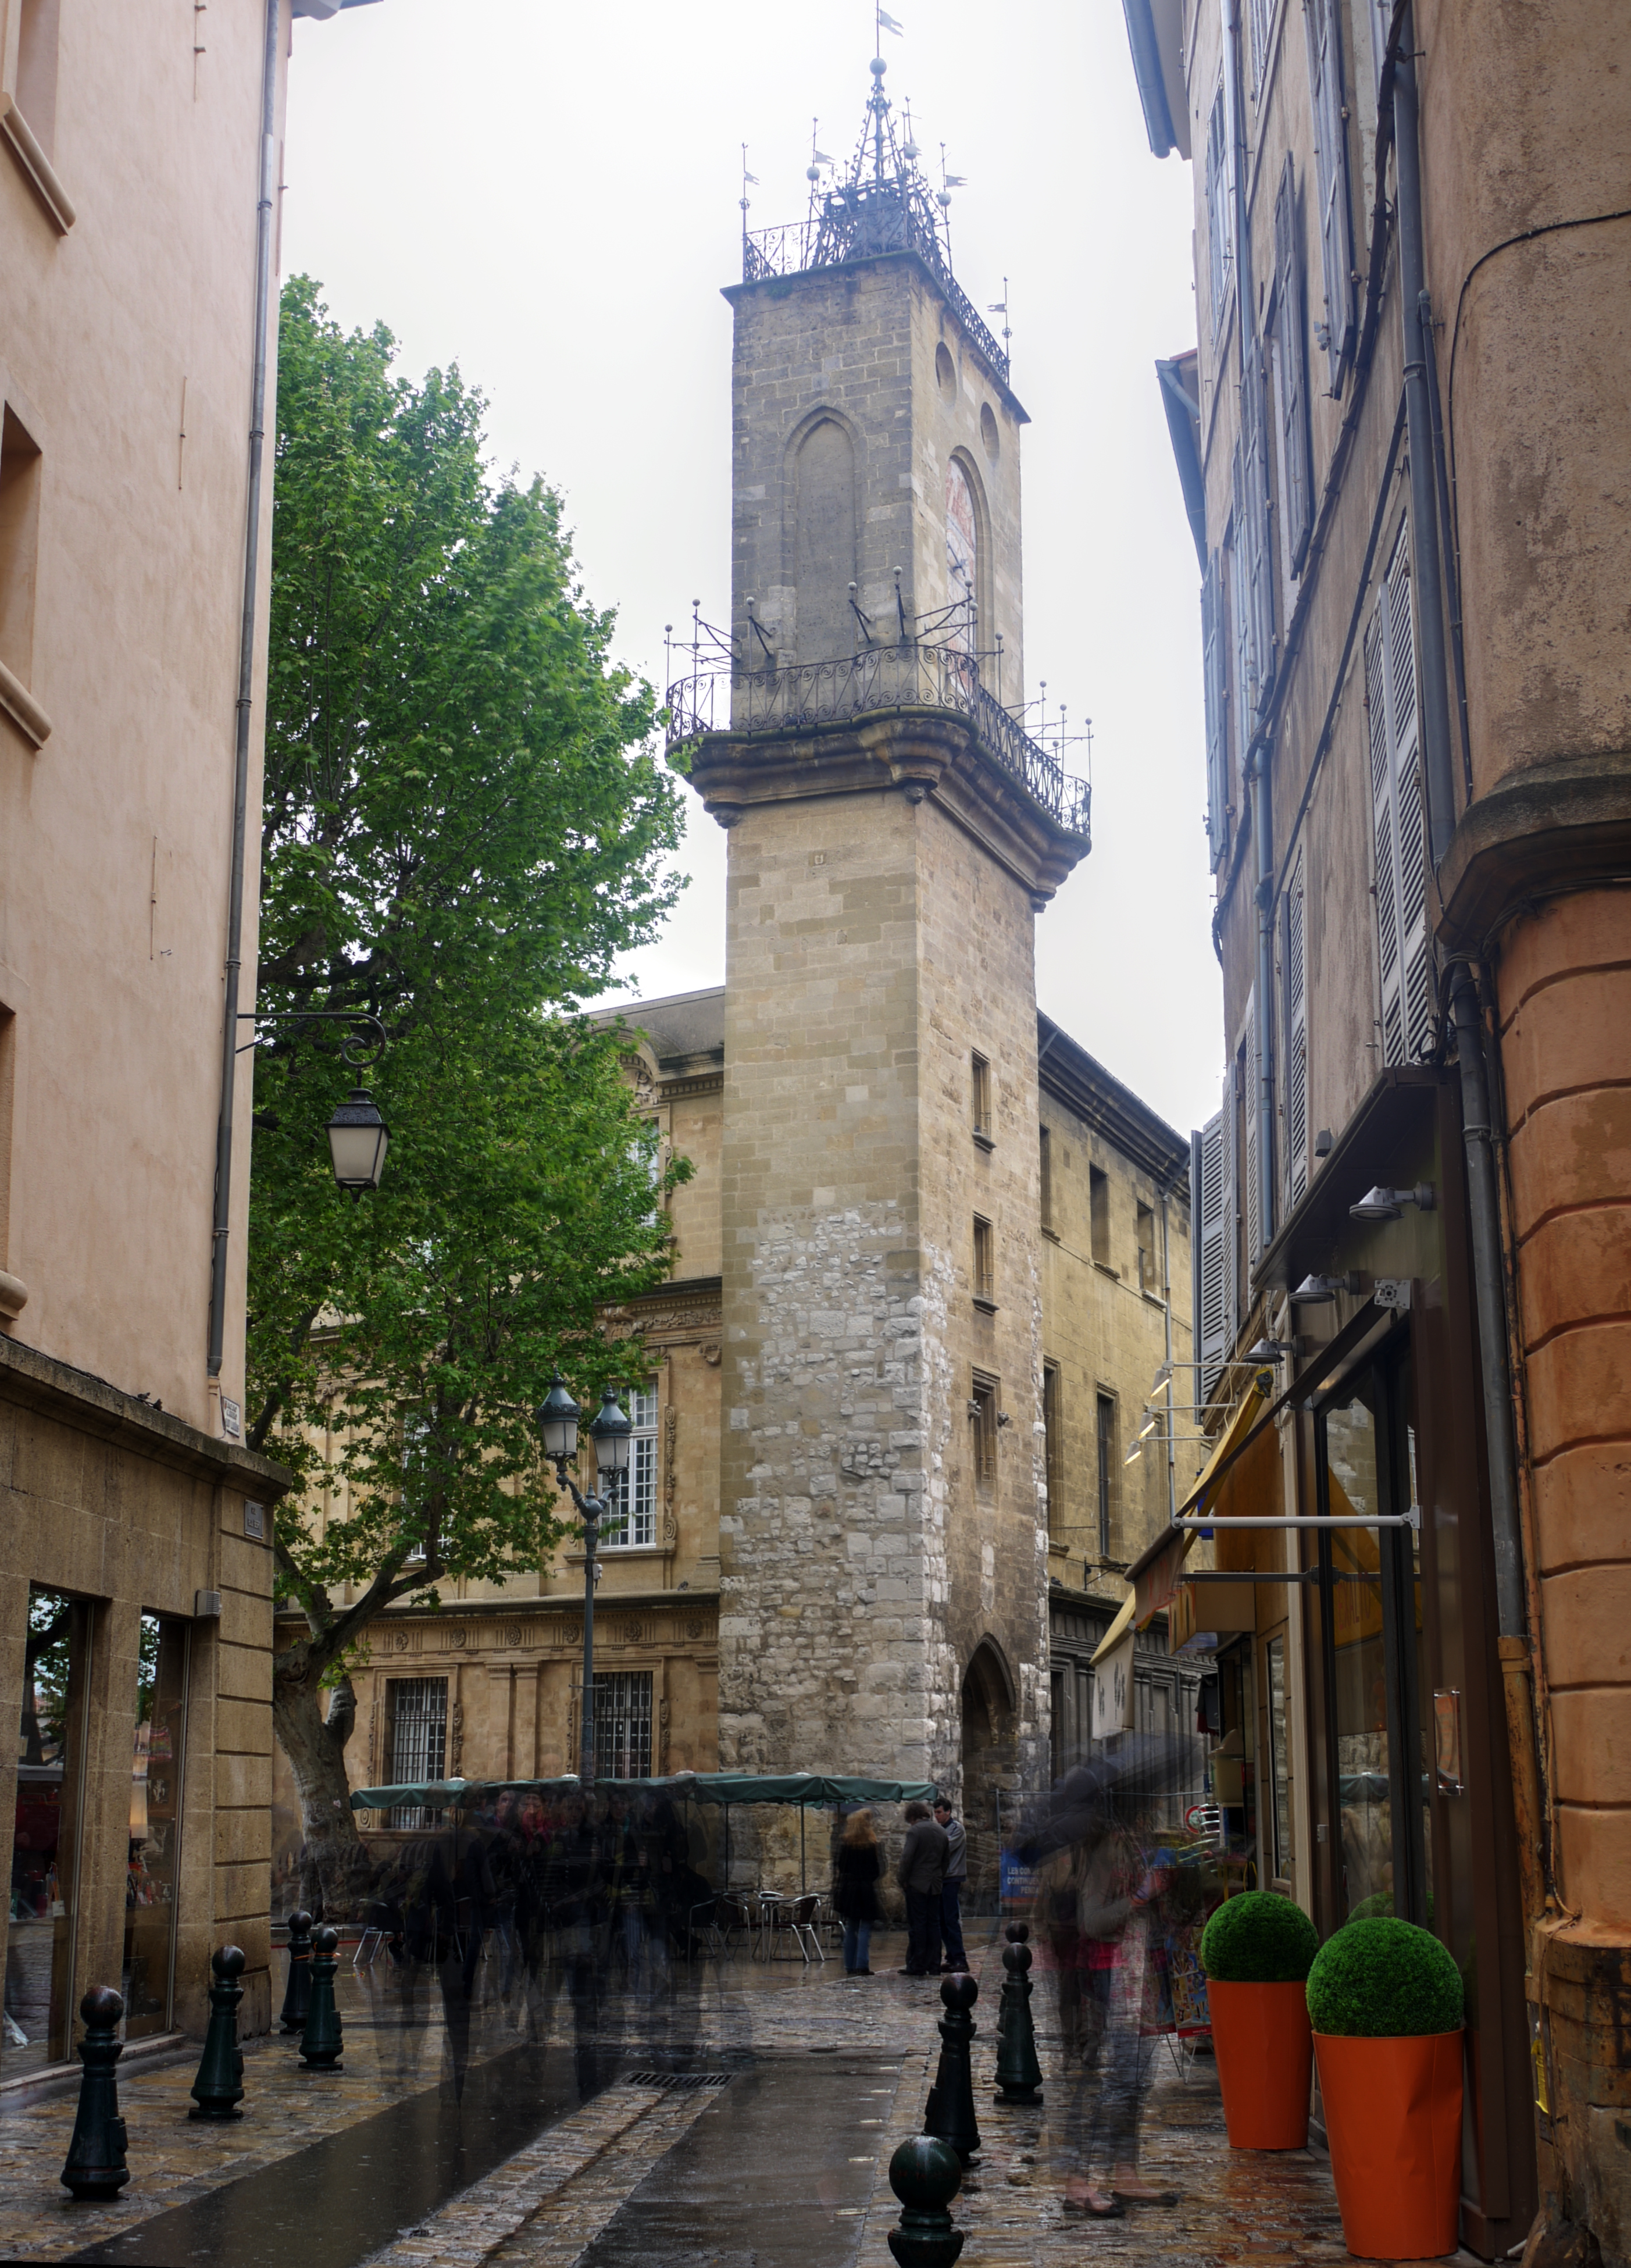 FileHotel de Ville Rue Paul Bert Aix en provence P1360279